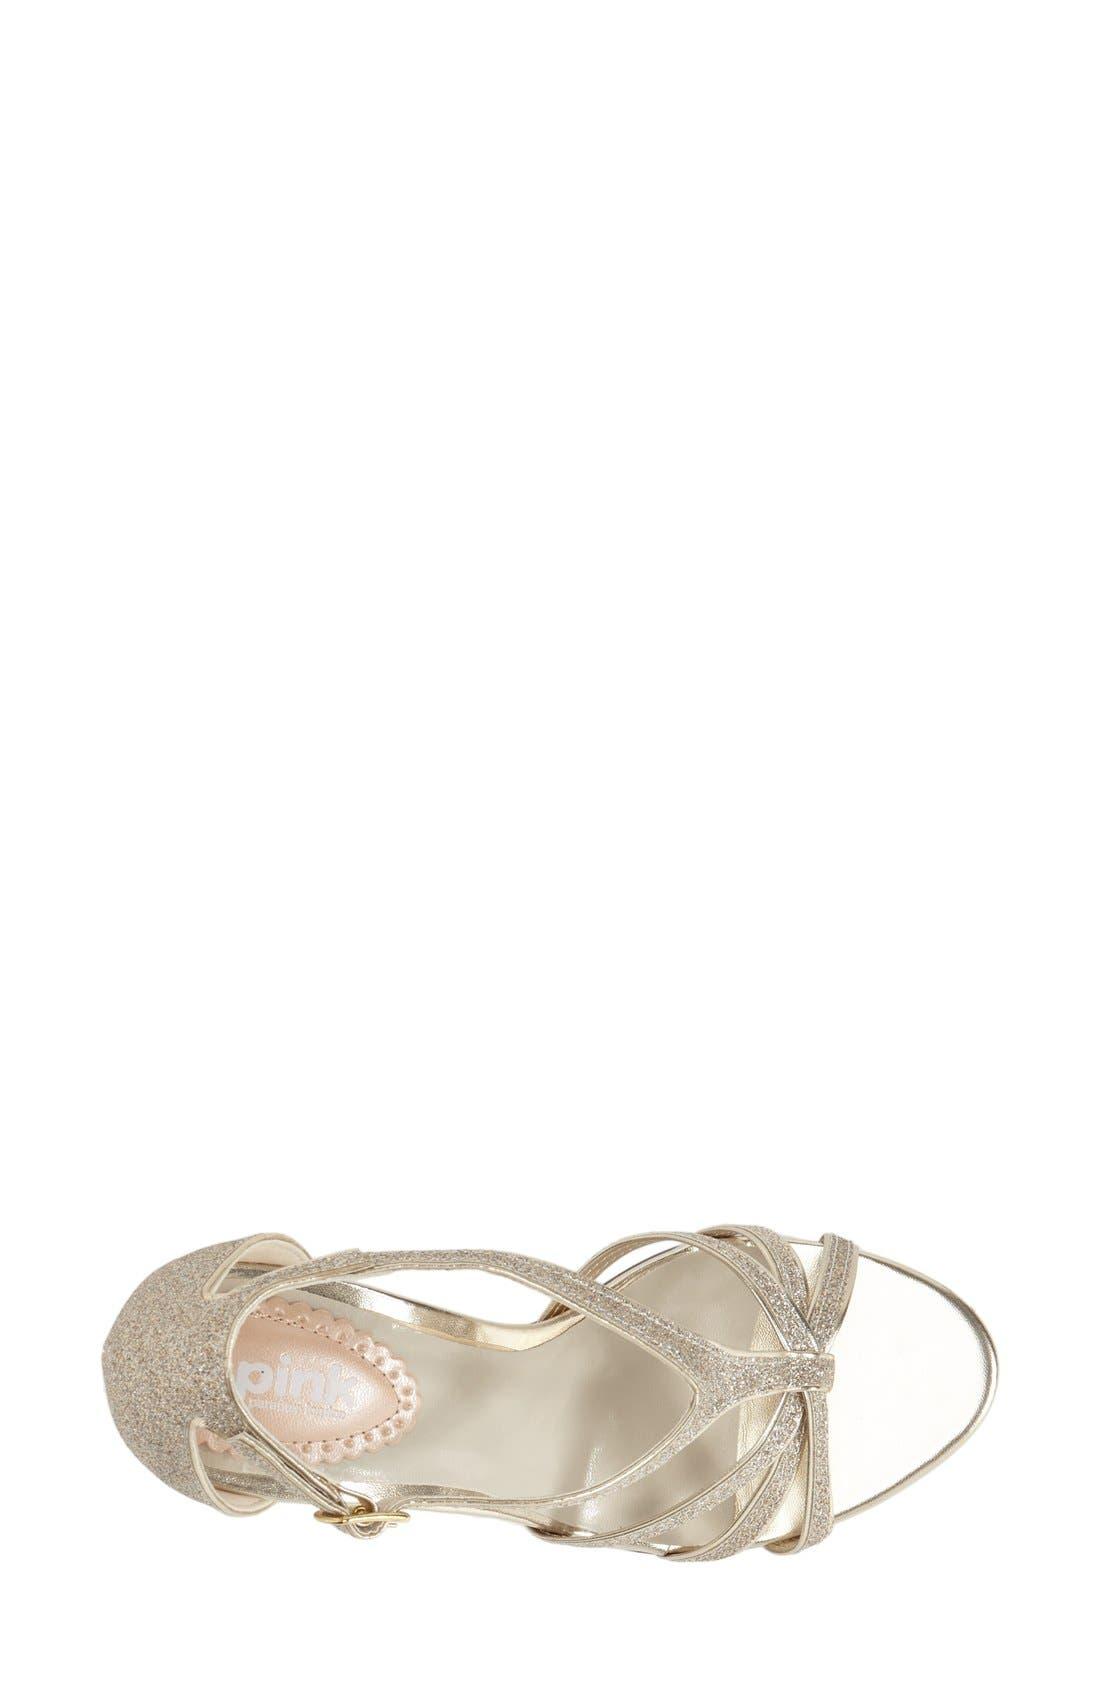 Alternate Image 3  - pink paradox london 'Vibrant' Sandal (Women)